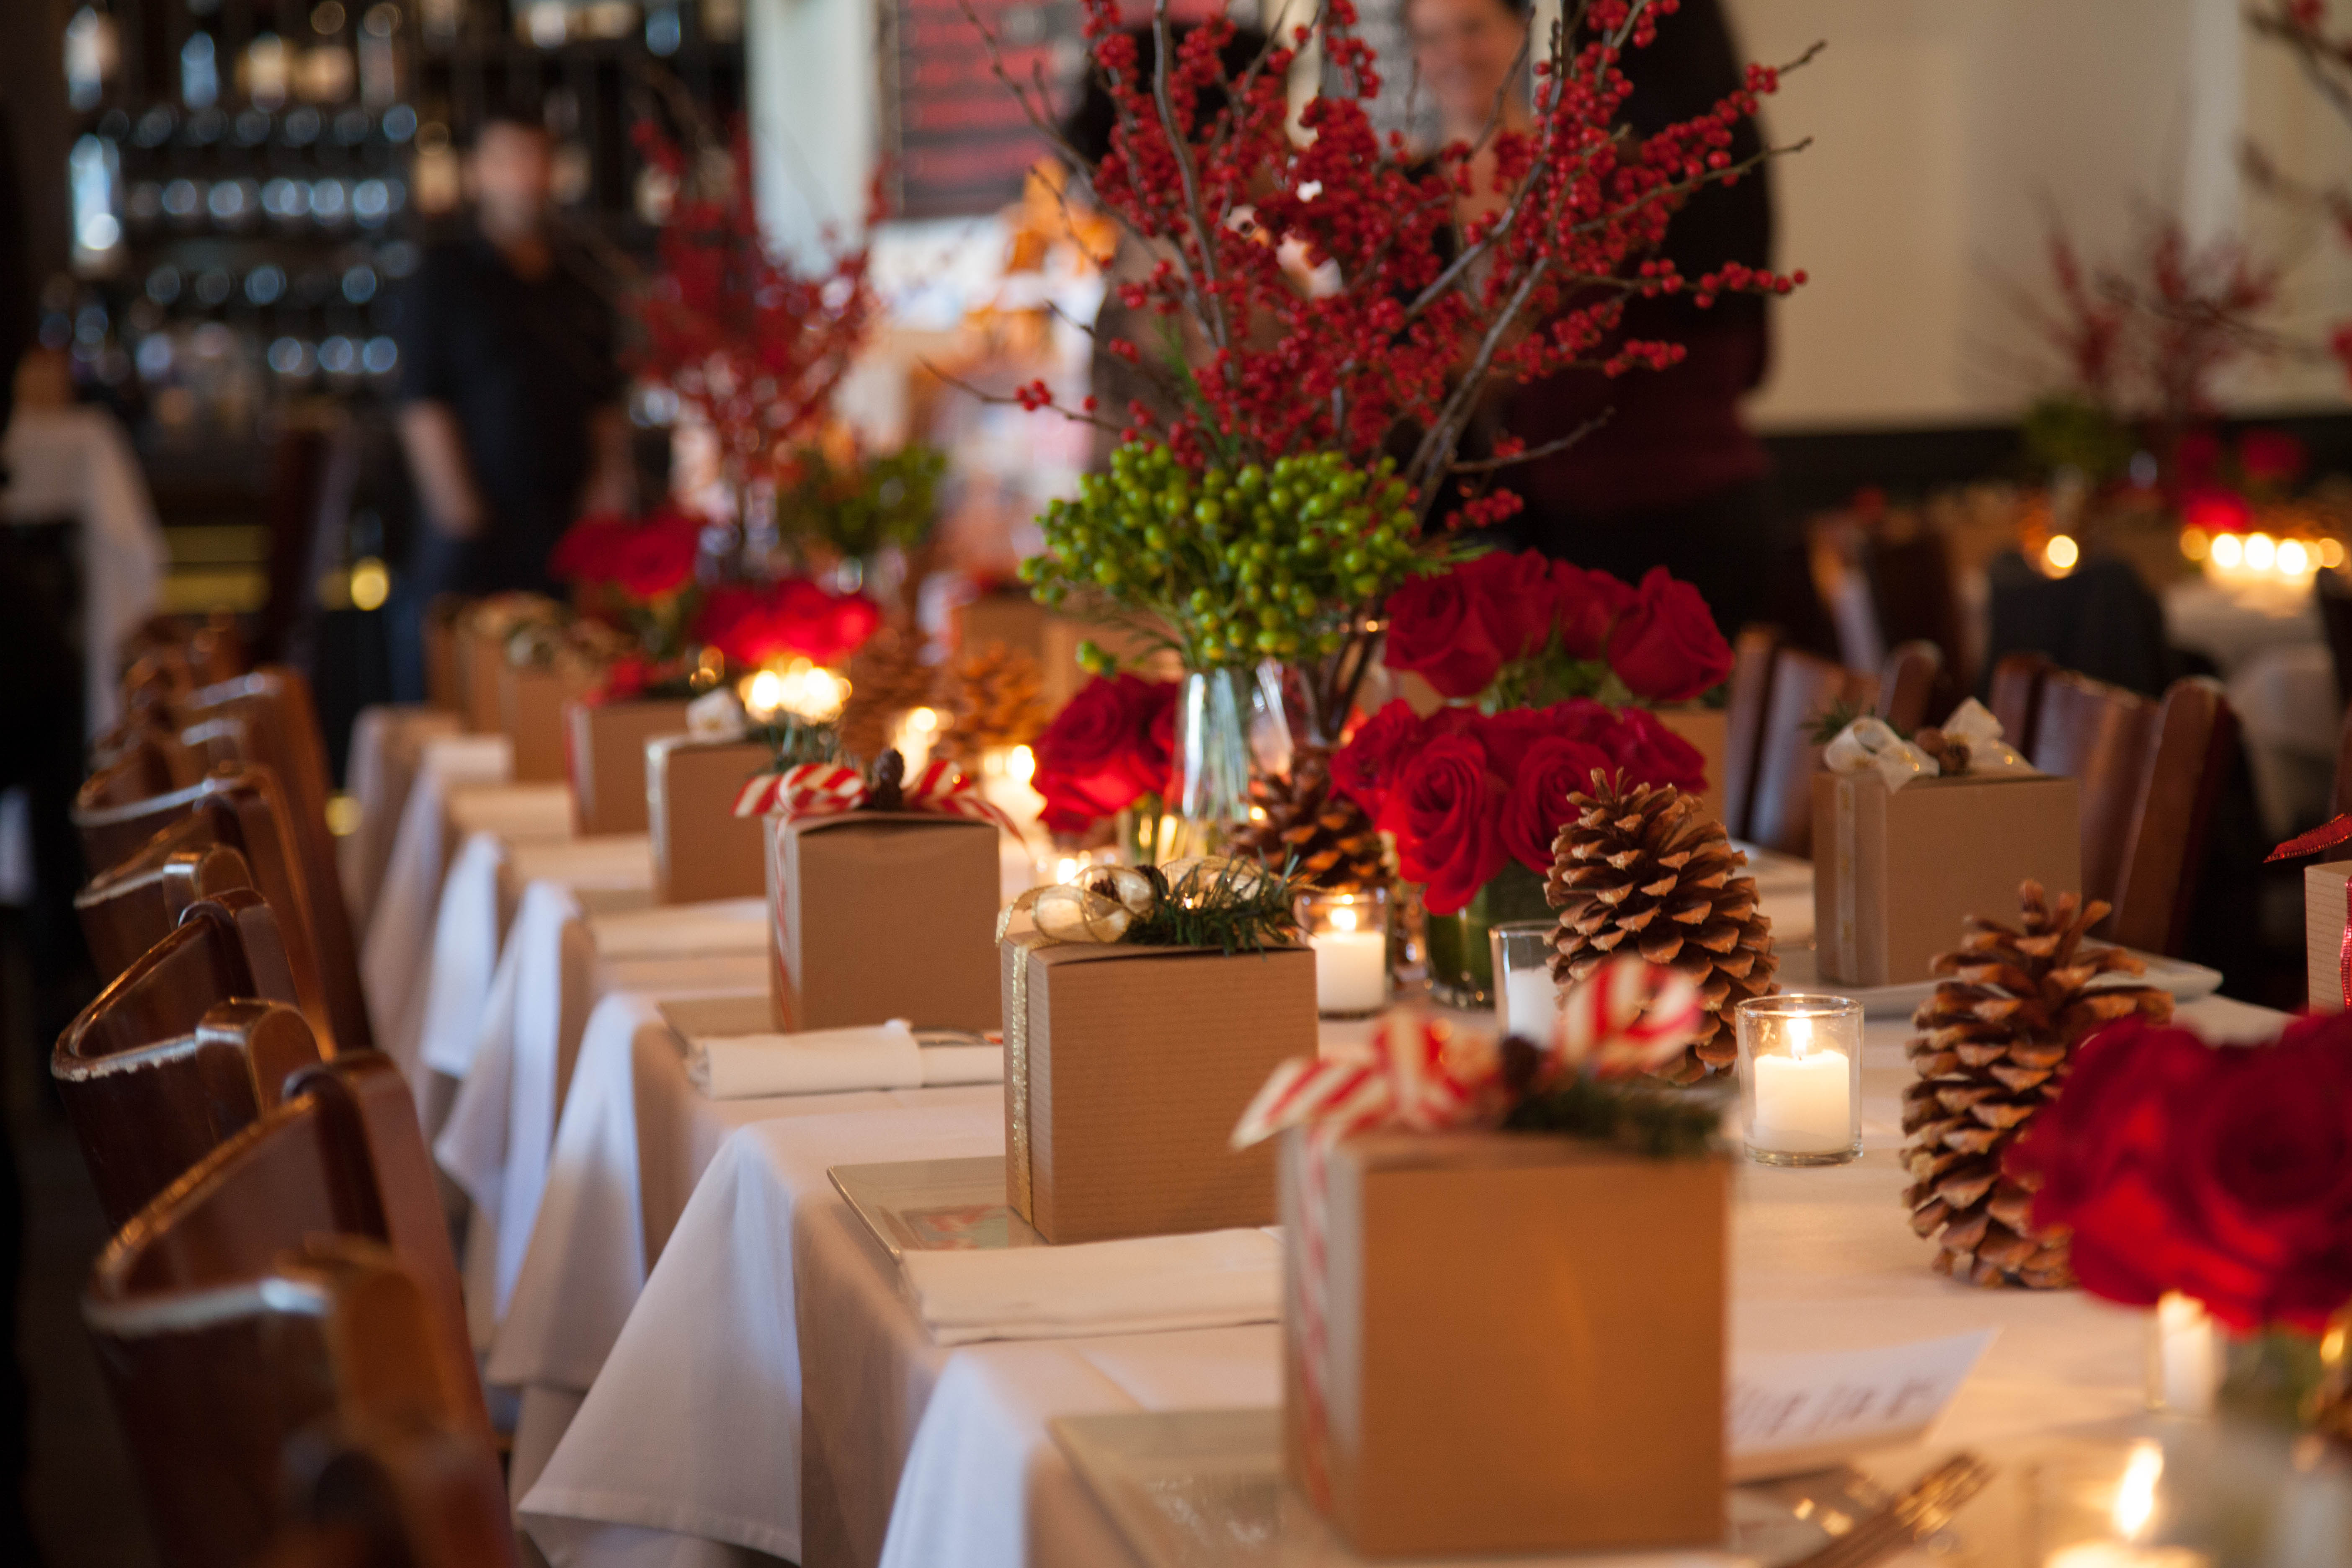 Entire Restaurant Buyout - The Upper West, Santa Monica